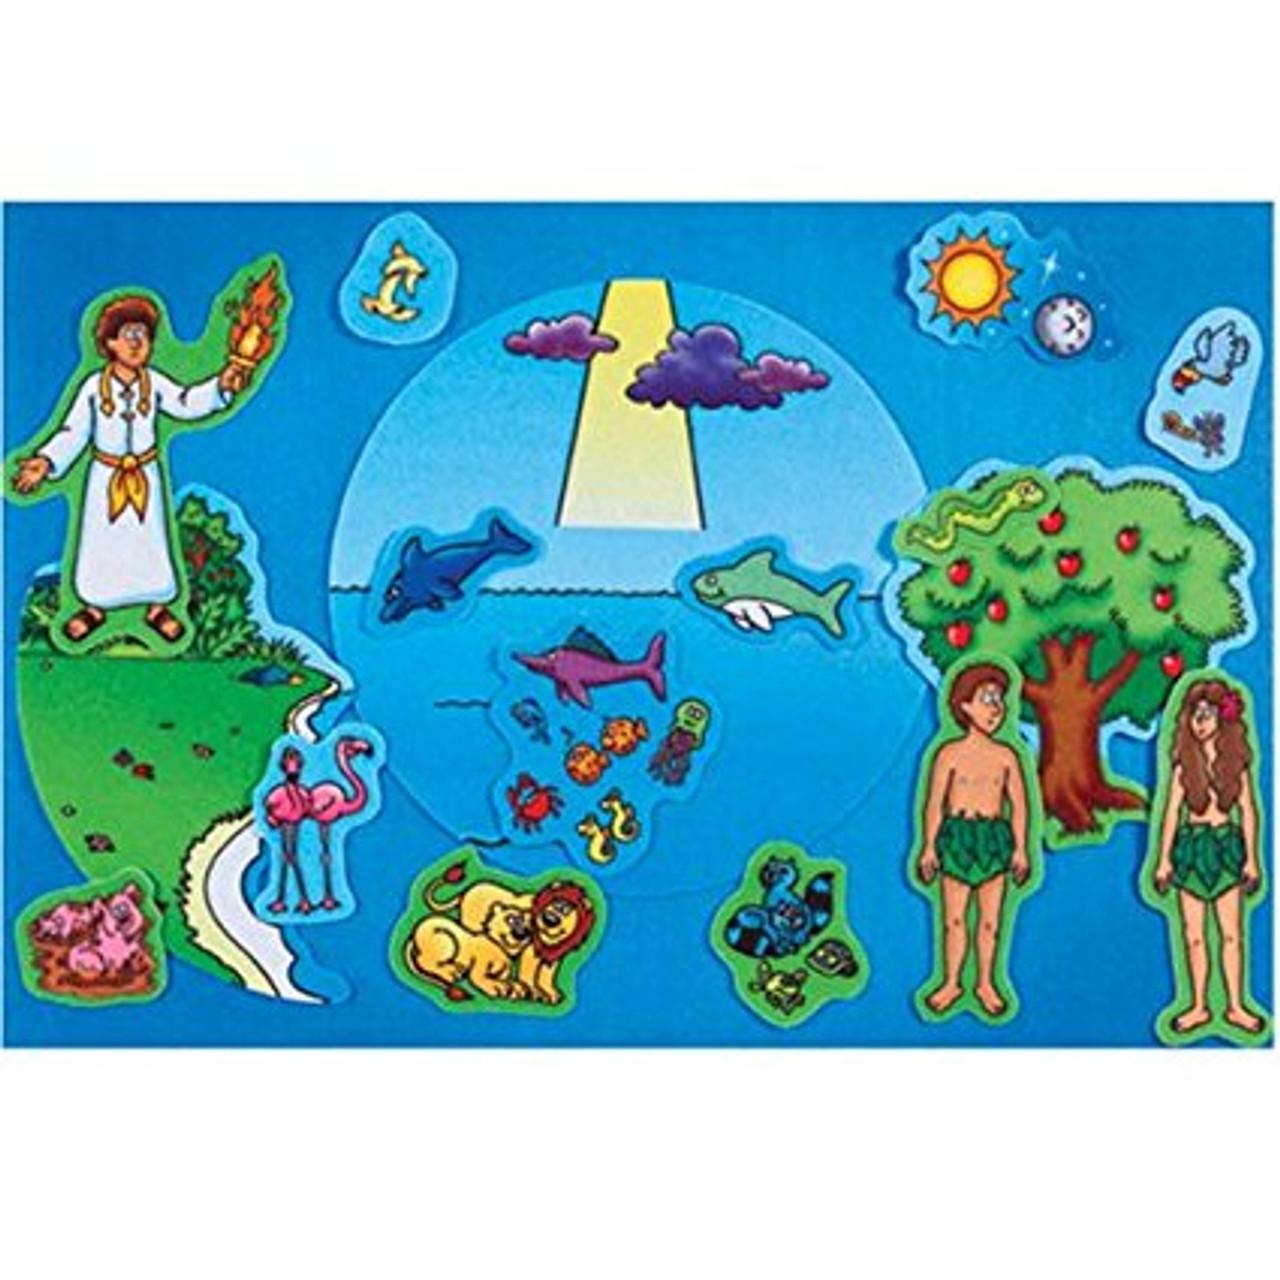 Creation Adam & Eve - Begginers Bible (Pre-cut)